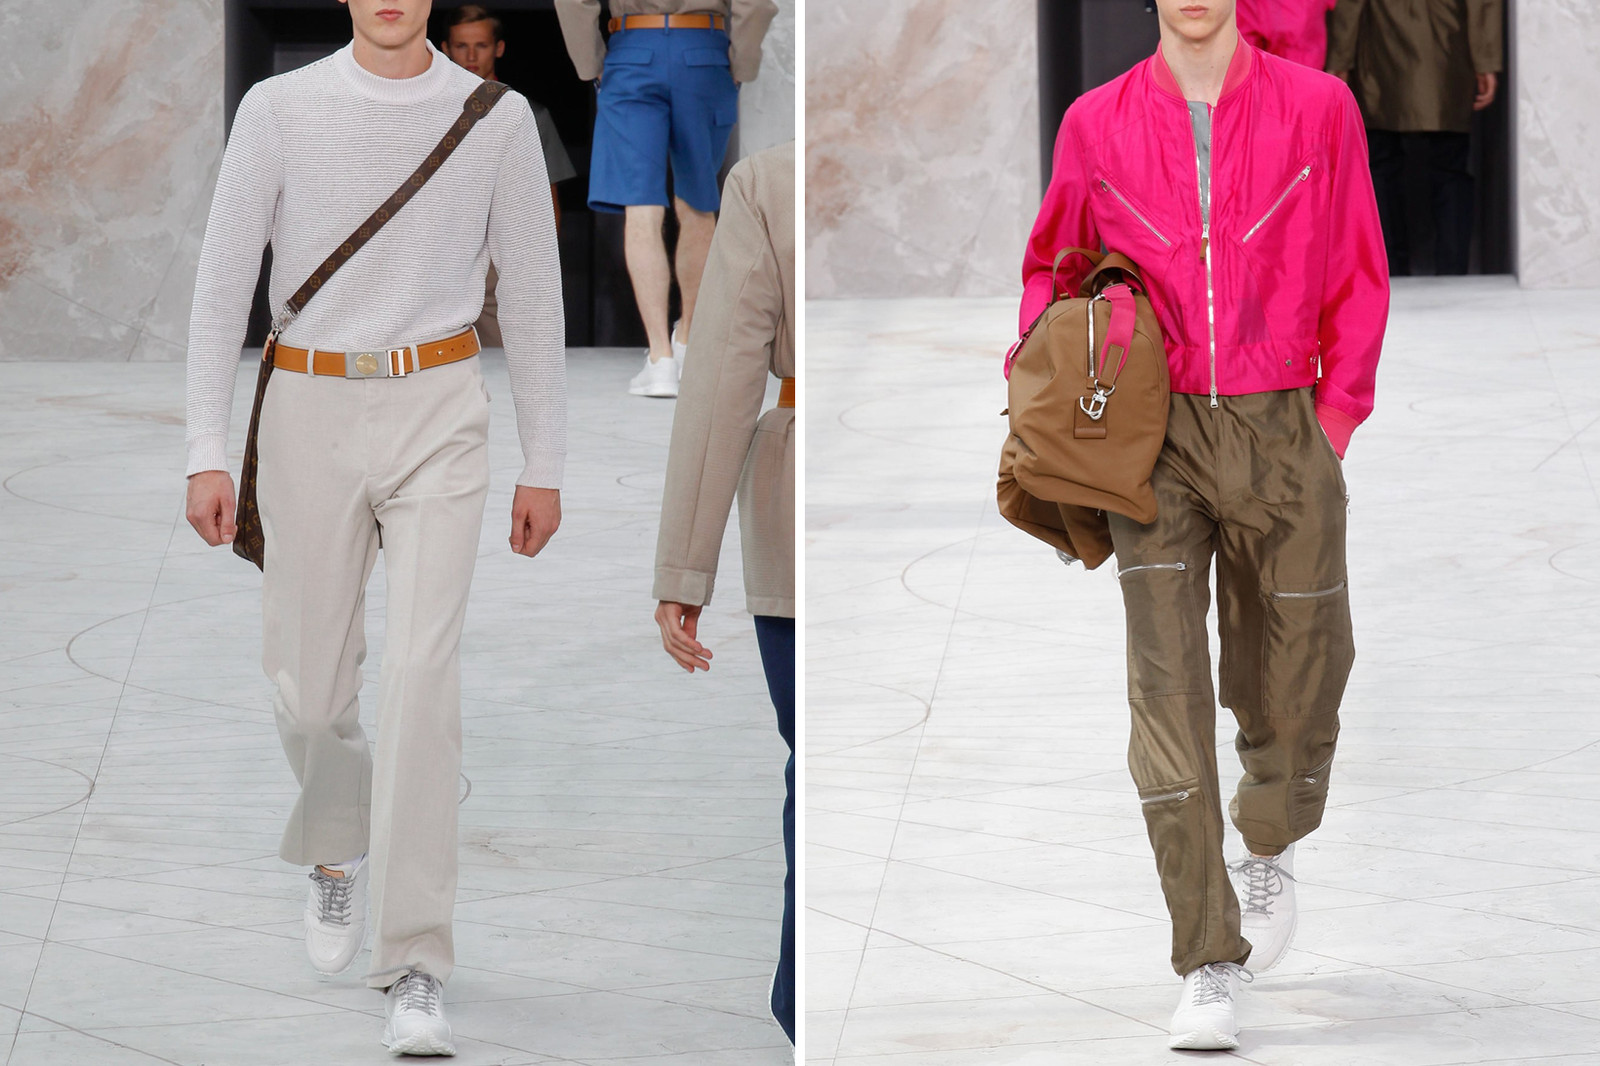 Kim Jones Louis Vuitton Supreme hiroshi fujiwara kapital Streetwear style high fashion runway collaboration